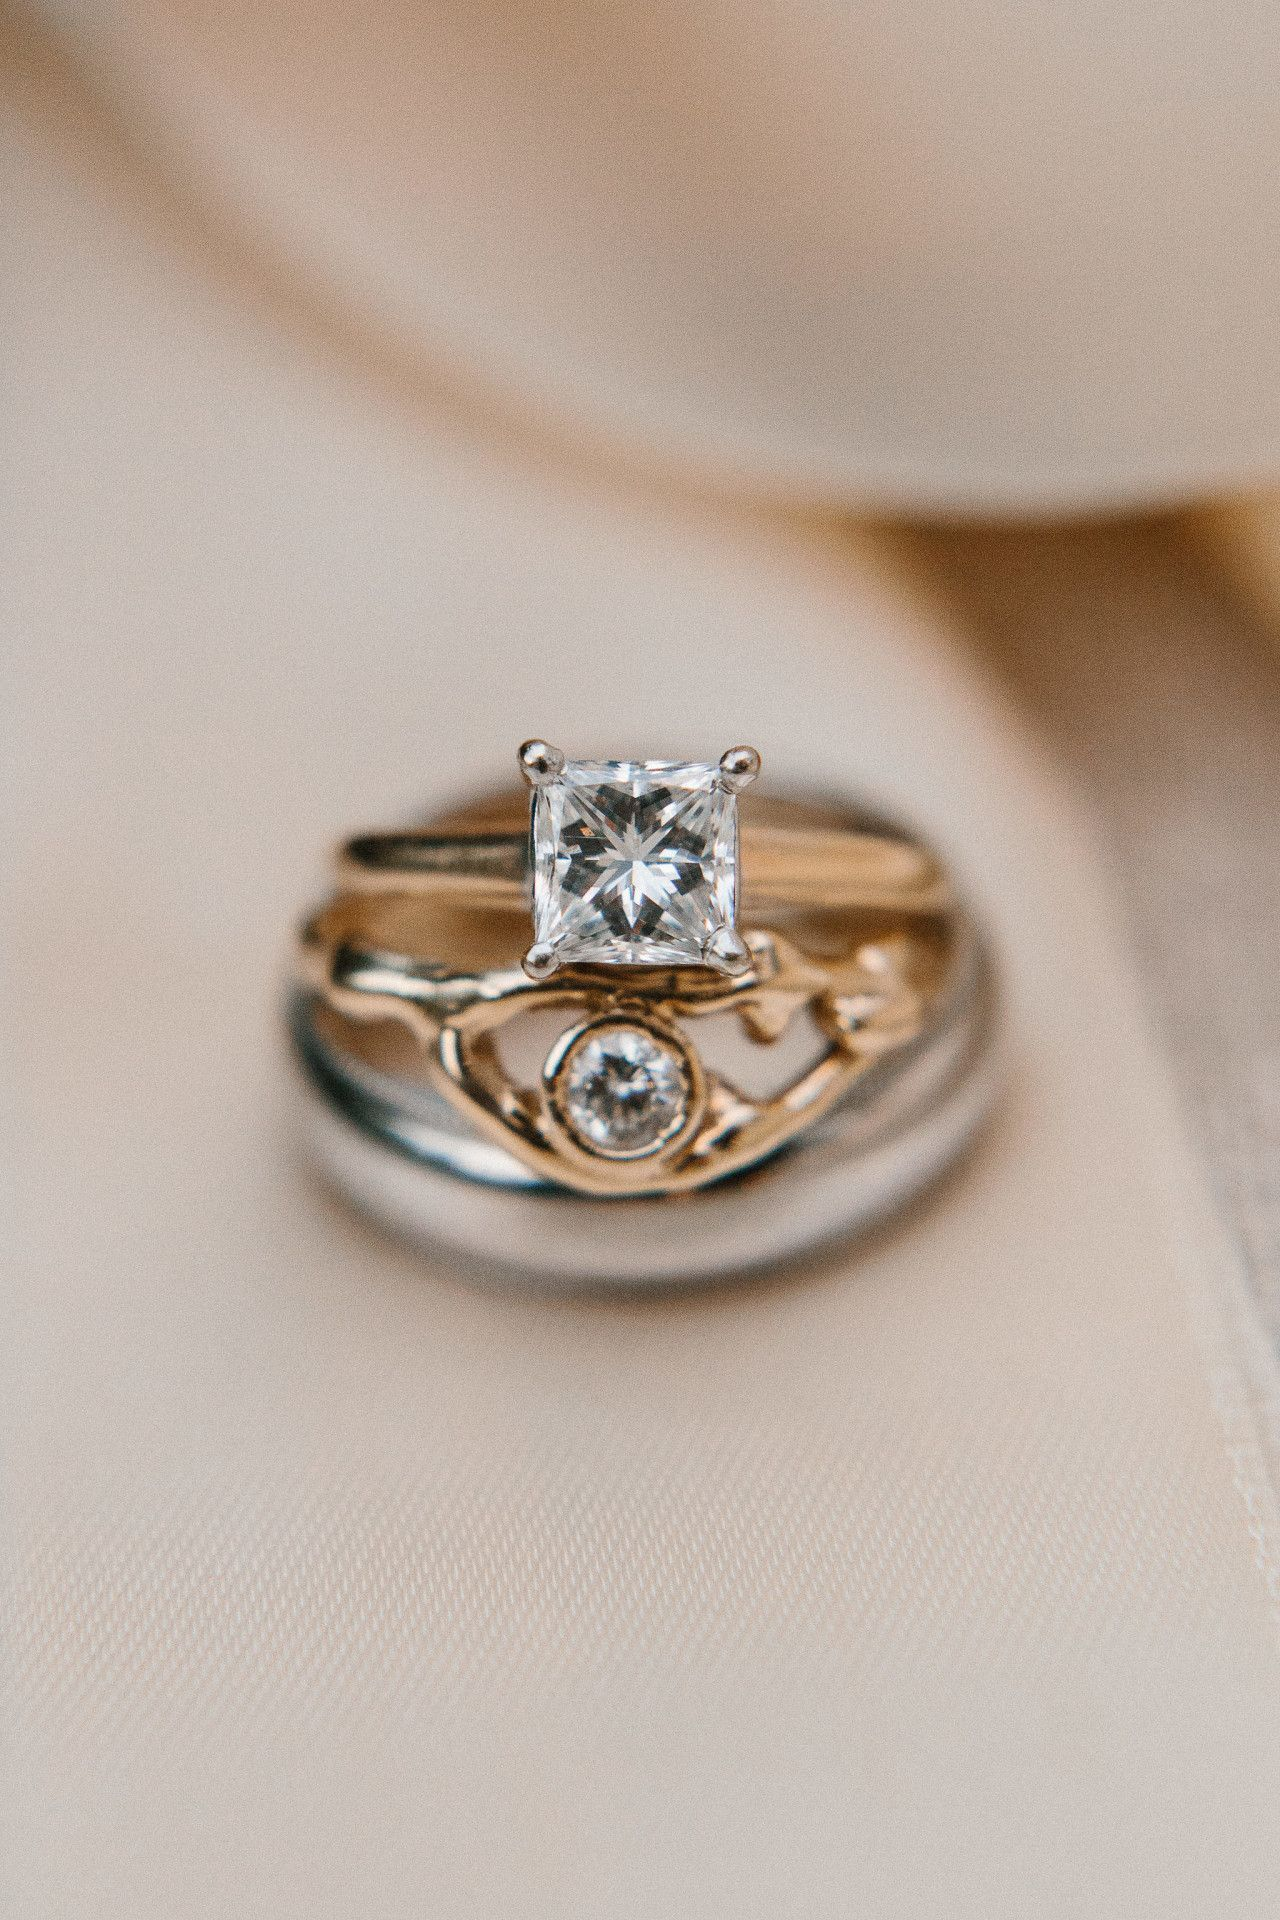 Simple gold wedding ring square diamond wedding ring unique